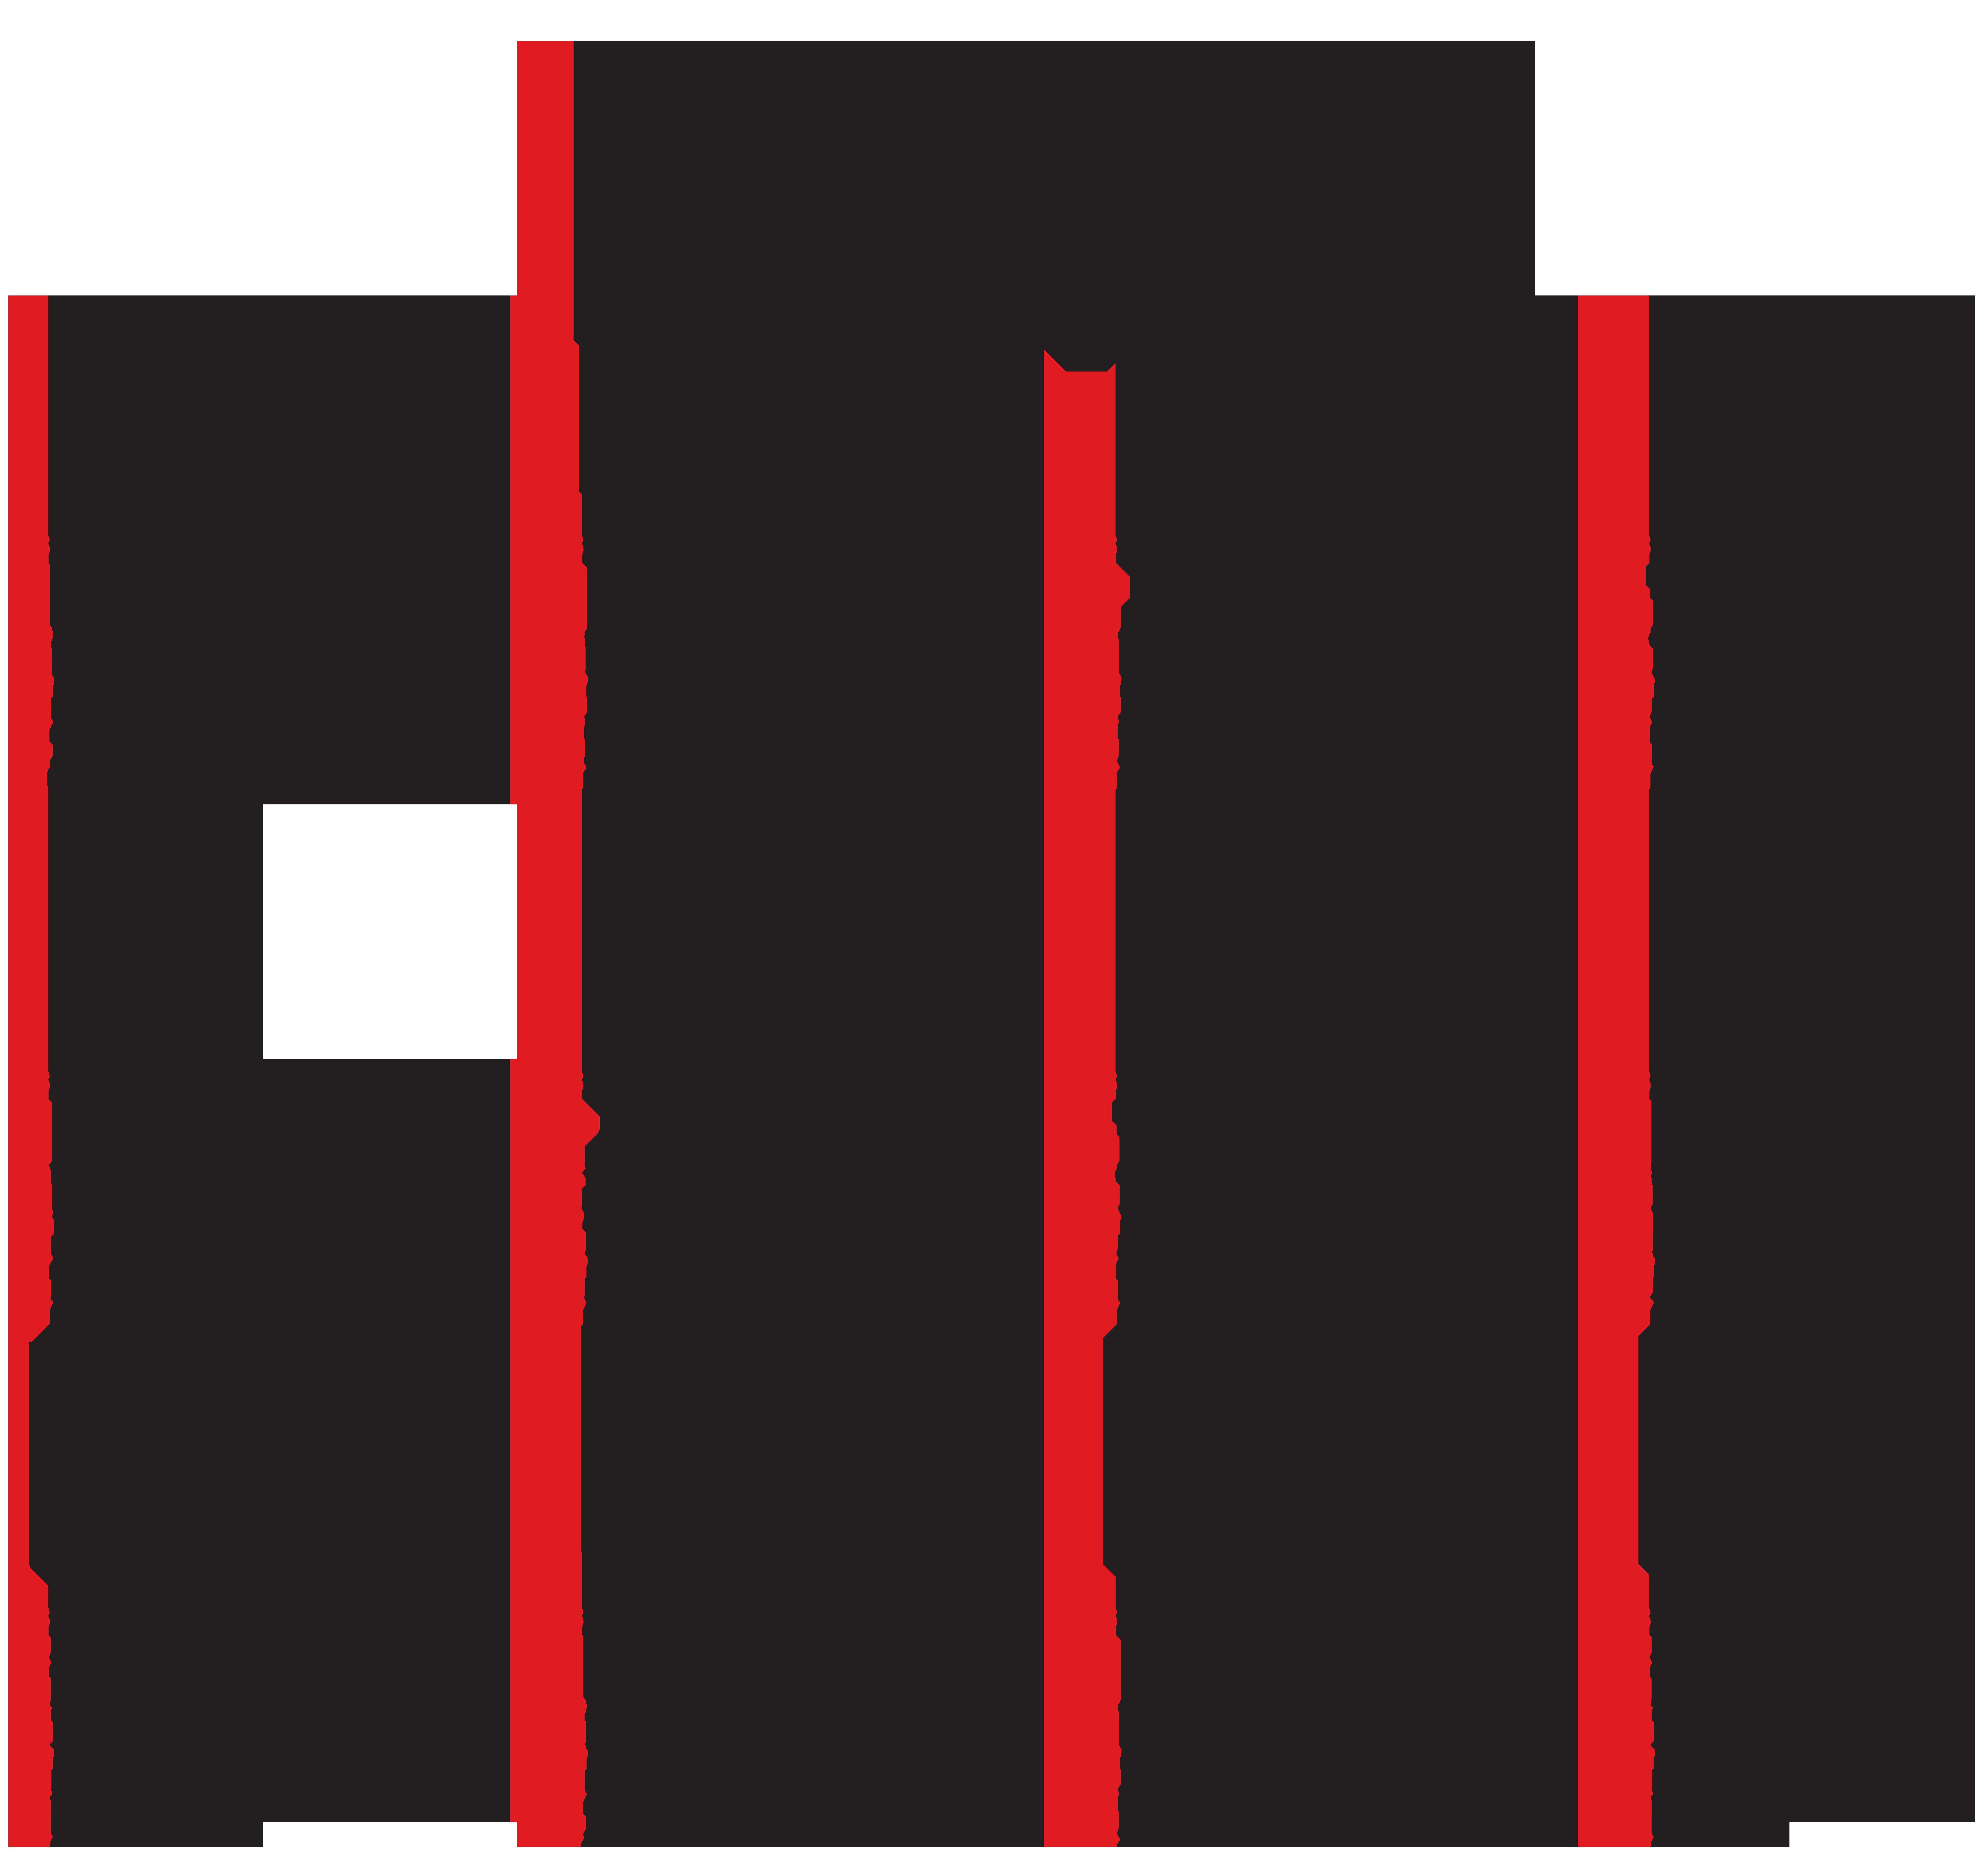 2019 Calendar Large Transparent PNG Image.